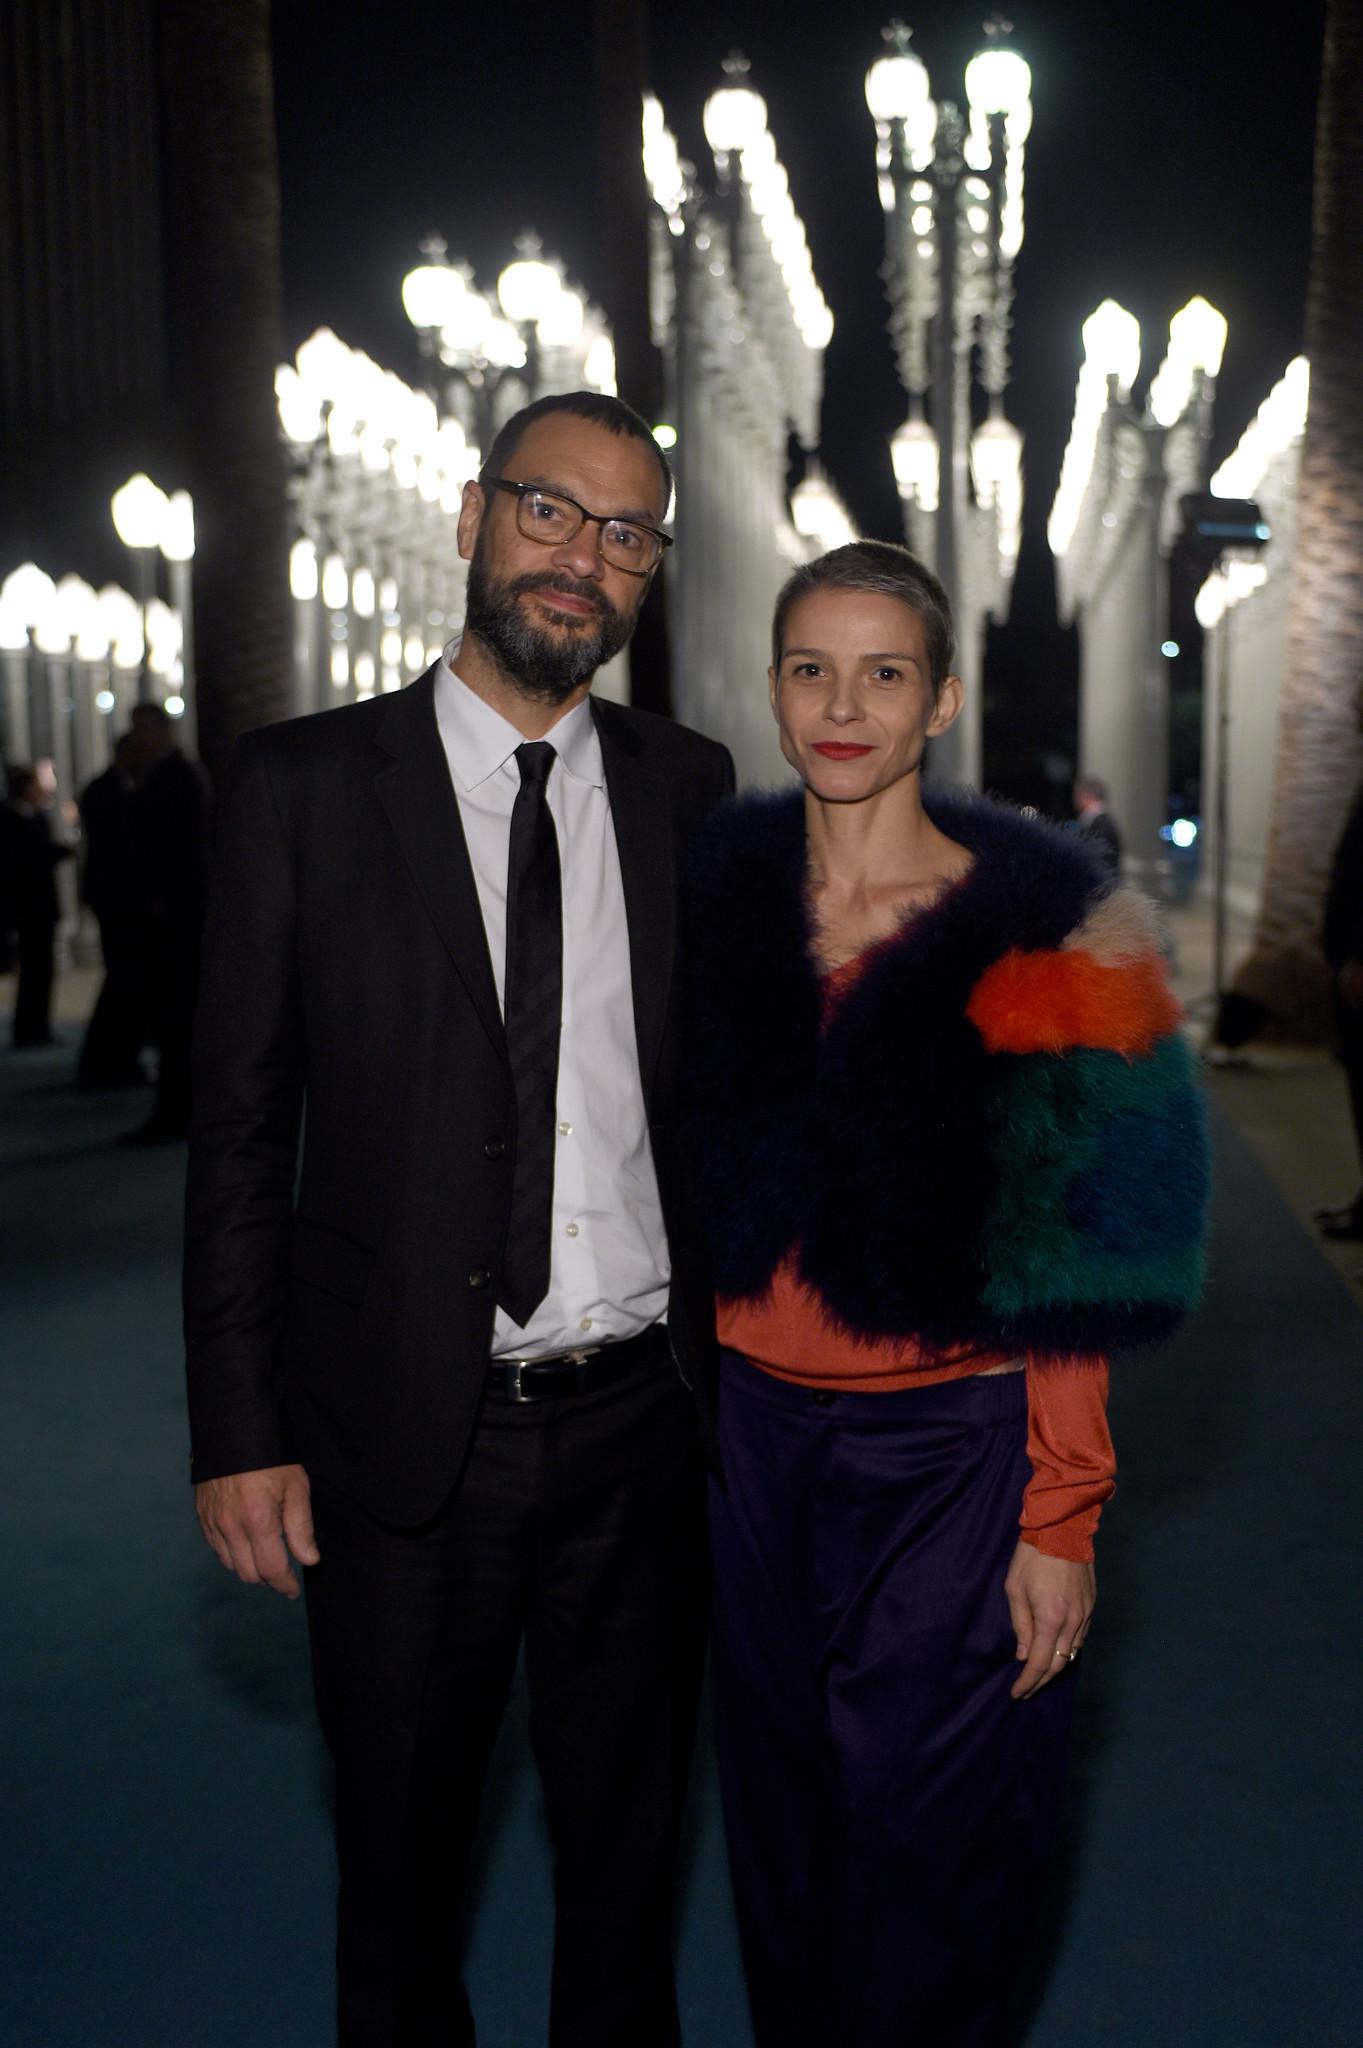 Artists Sam Durant and Ana Prvacki at LACMA 2015 Art+Film Gala honoring James Turrell and Alejandro G Iñárritu,